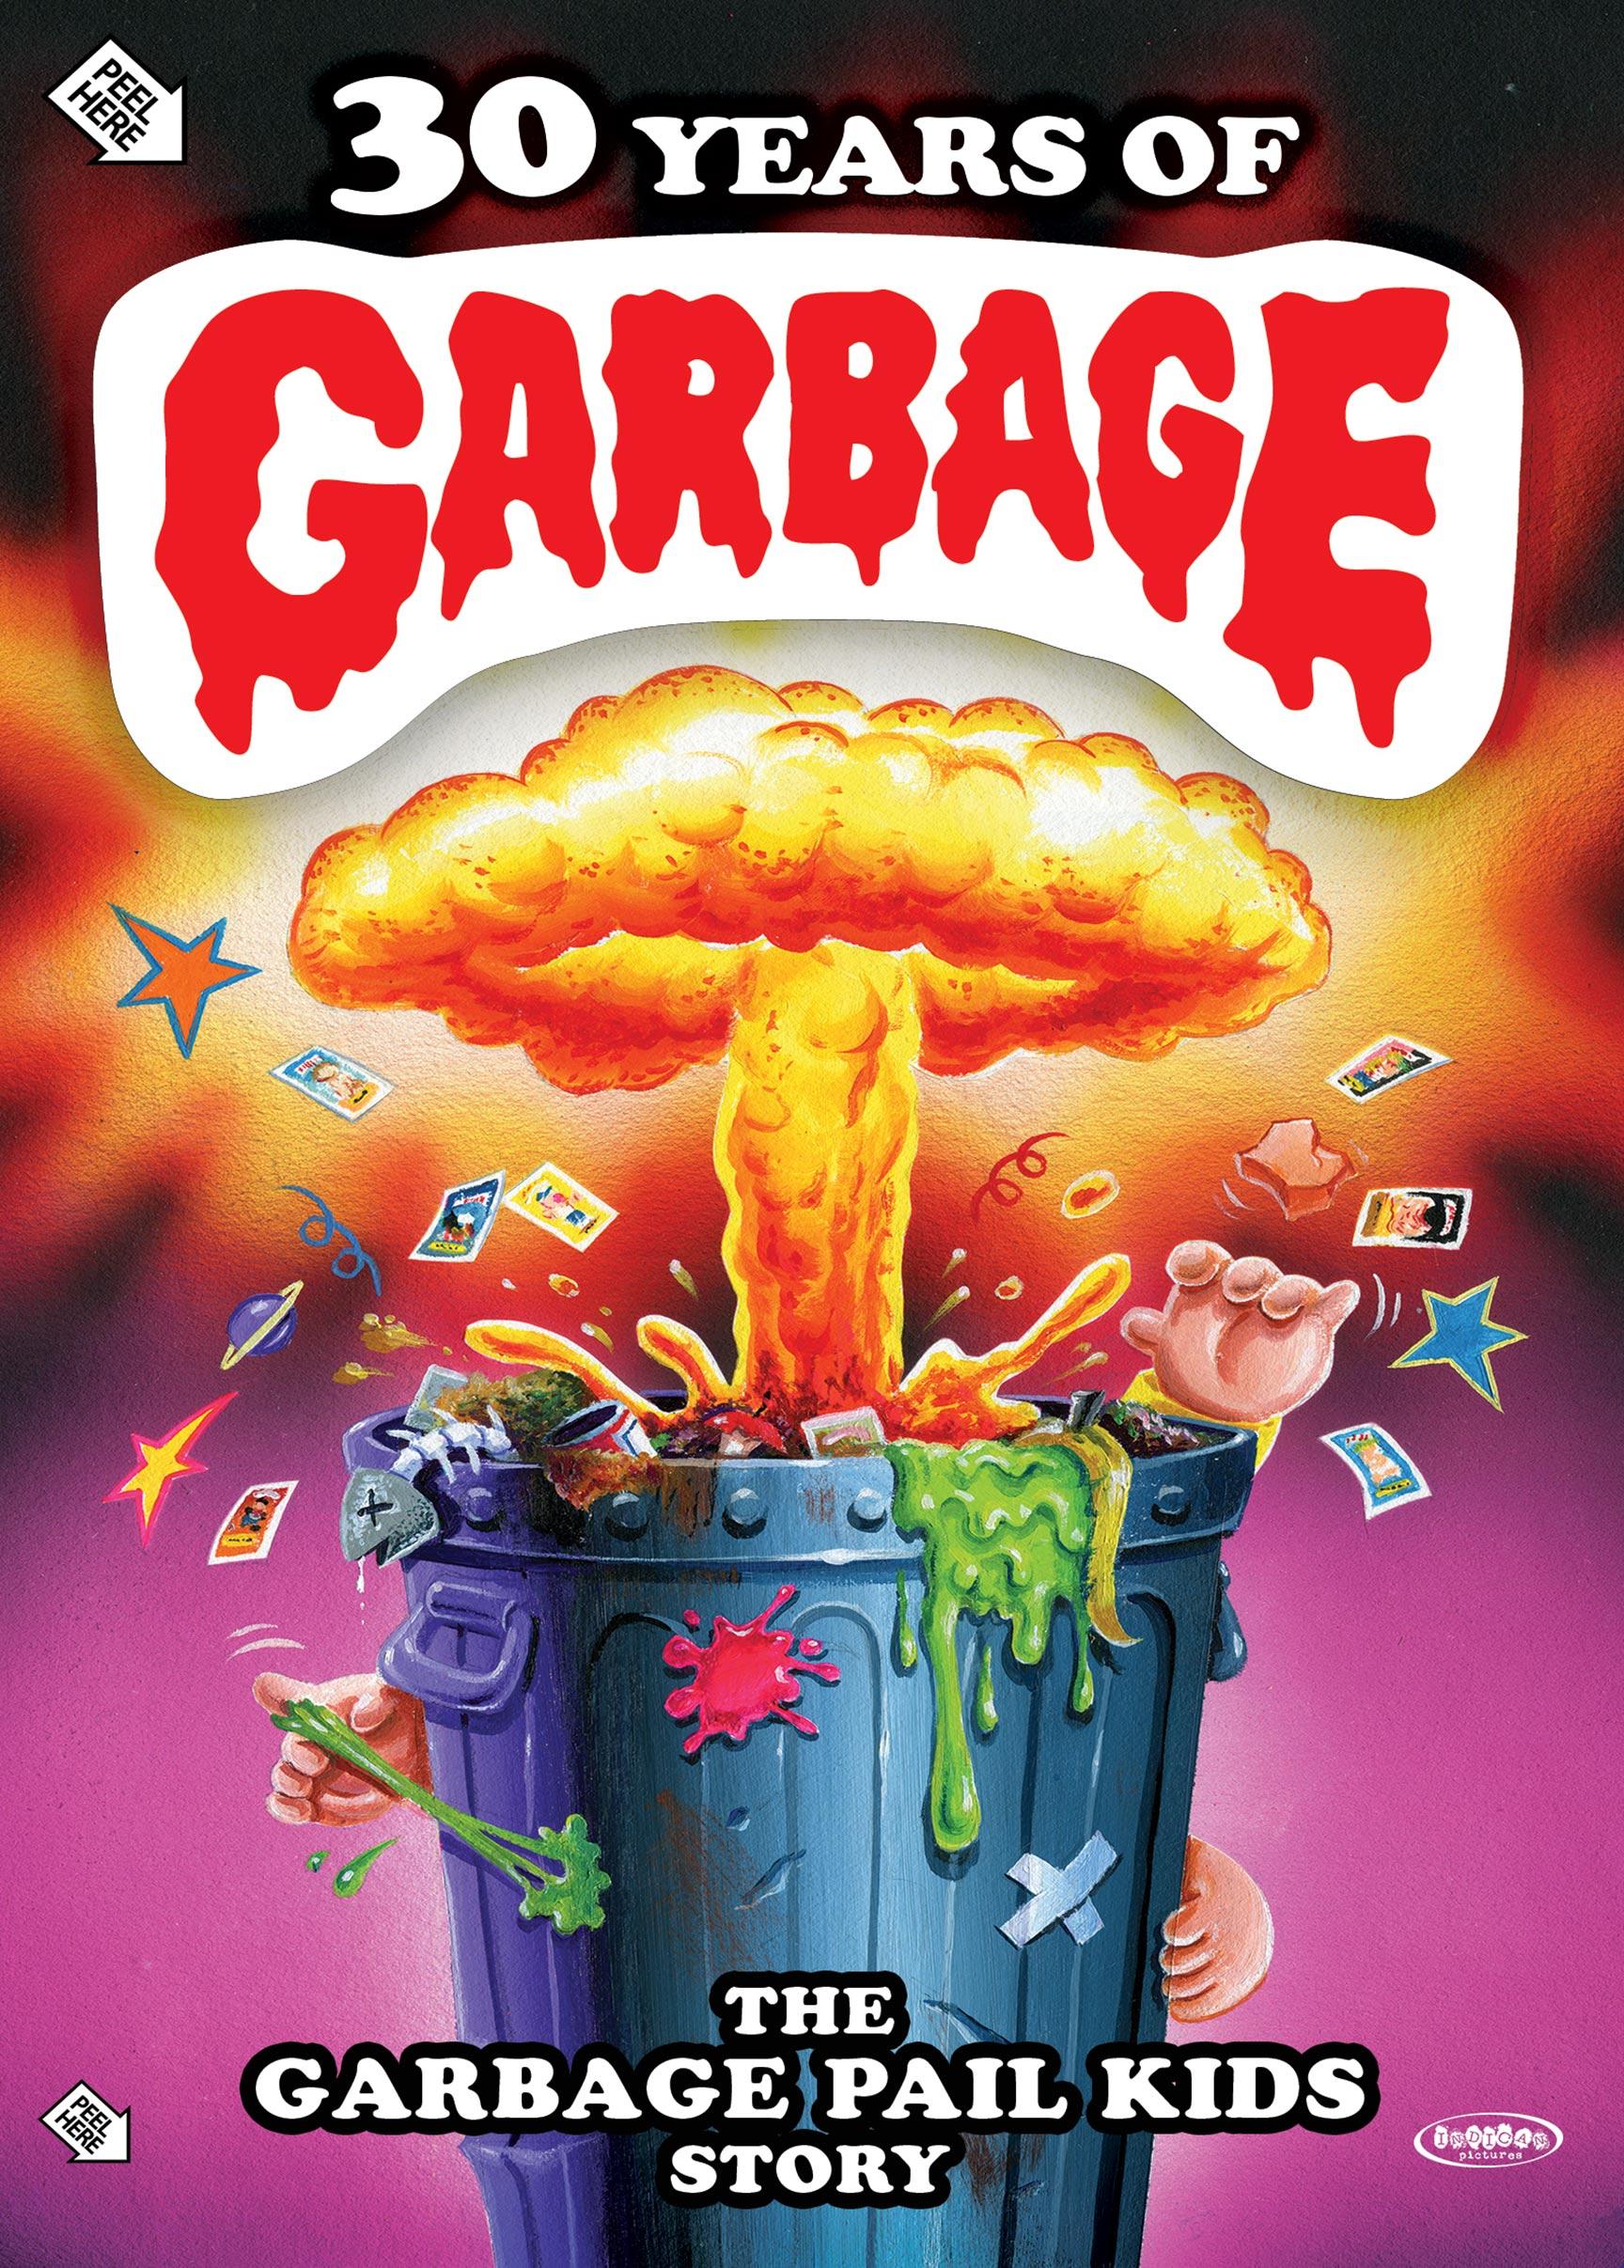 30 Years of Garbage: The Garbage Pail Kids Story Poster #1